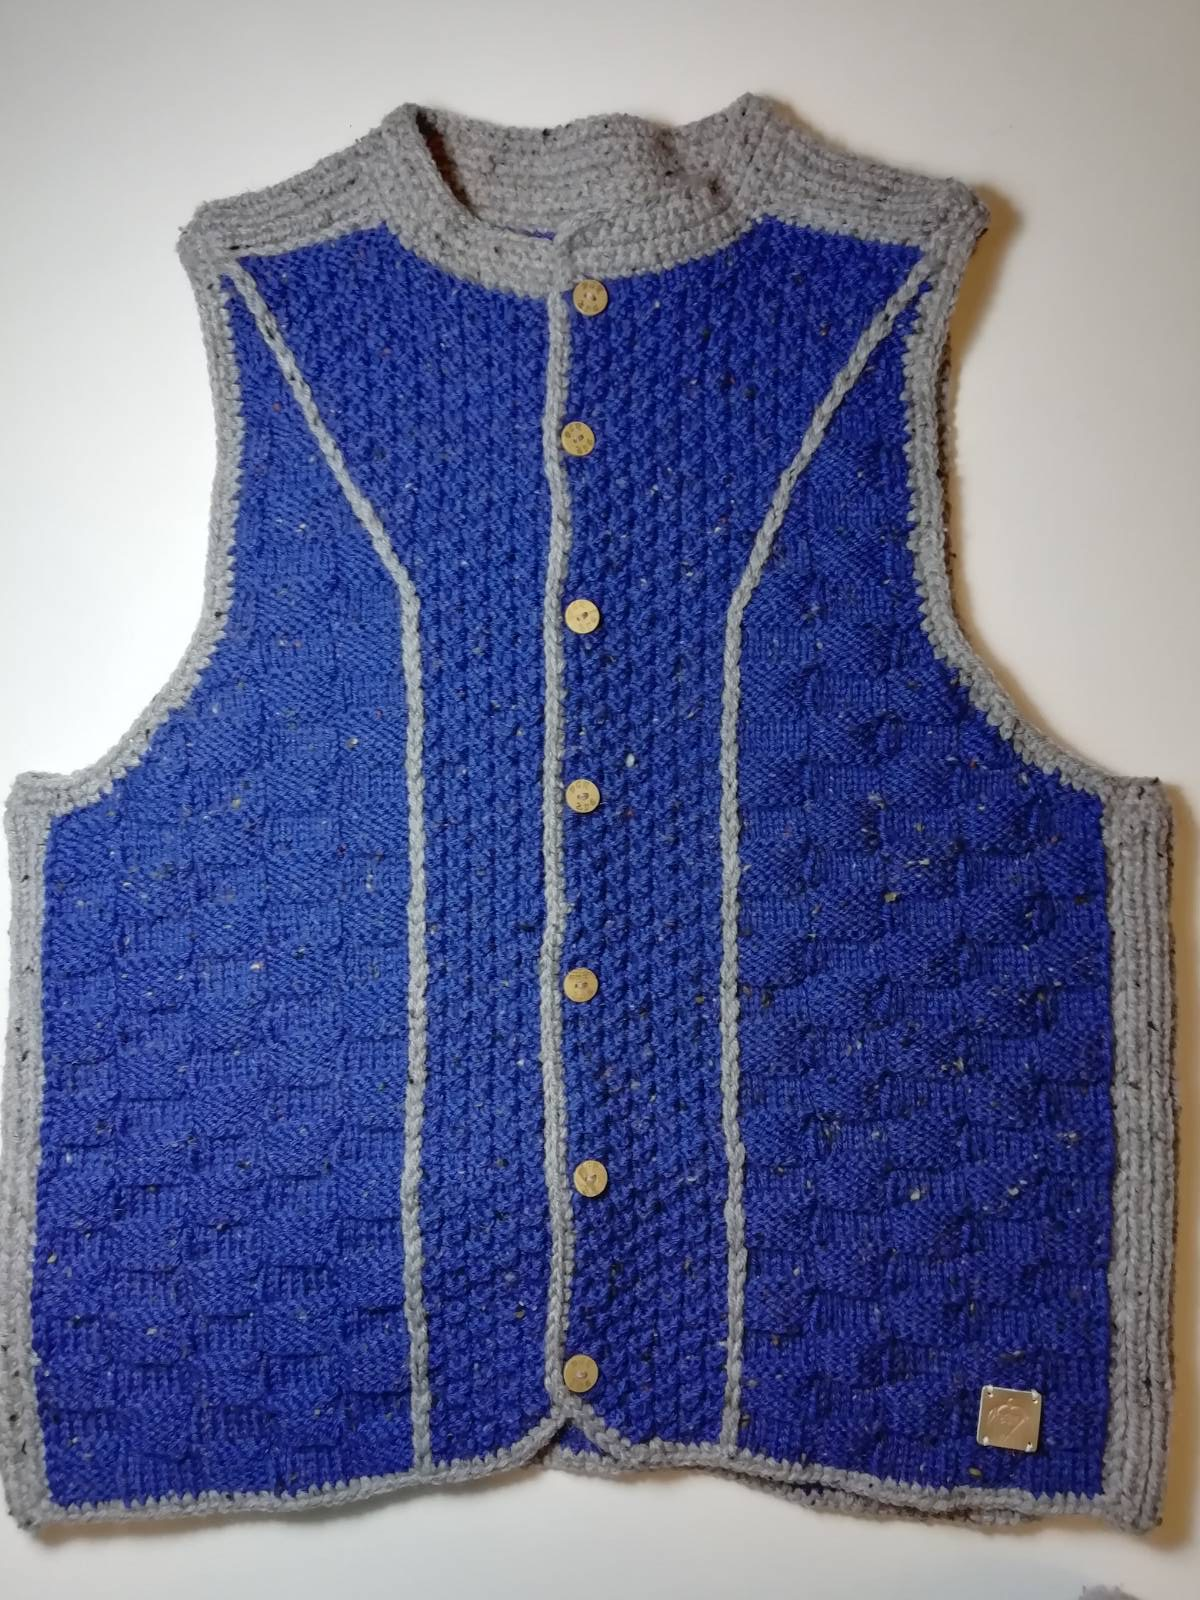 Handmade knitted vest blue/grey